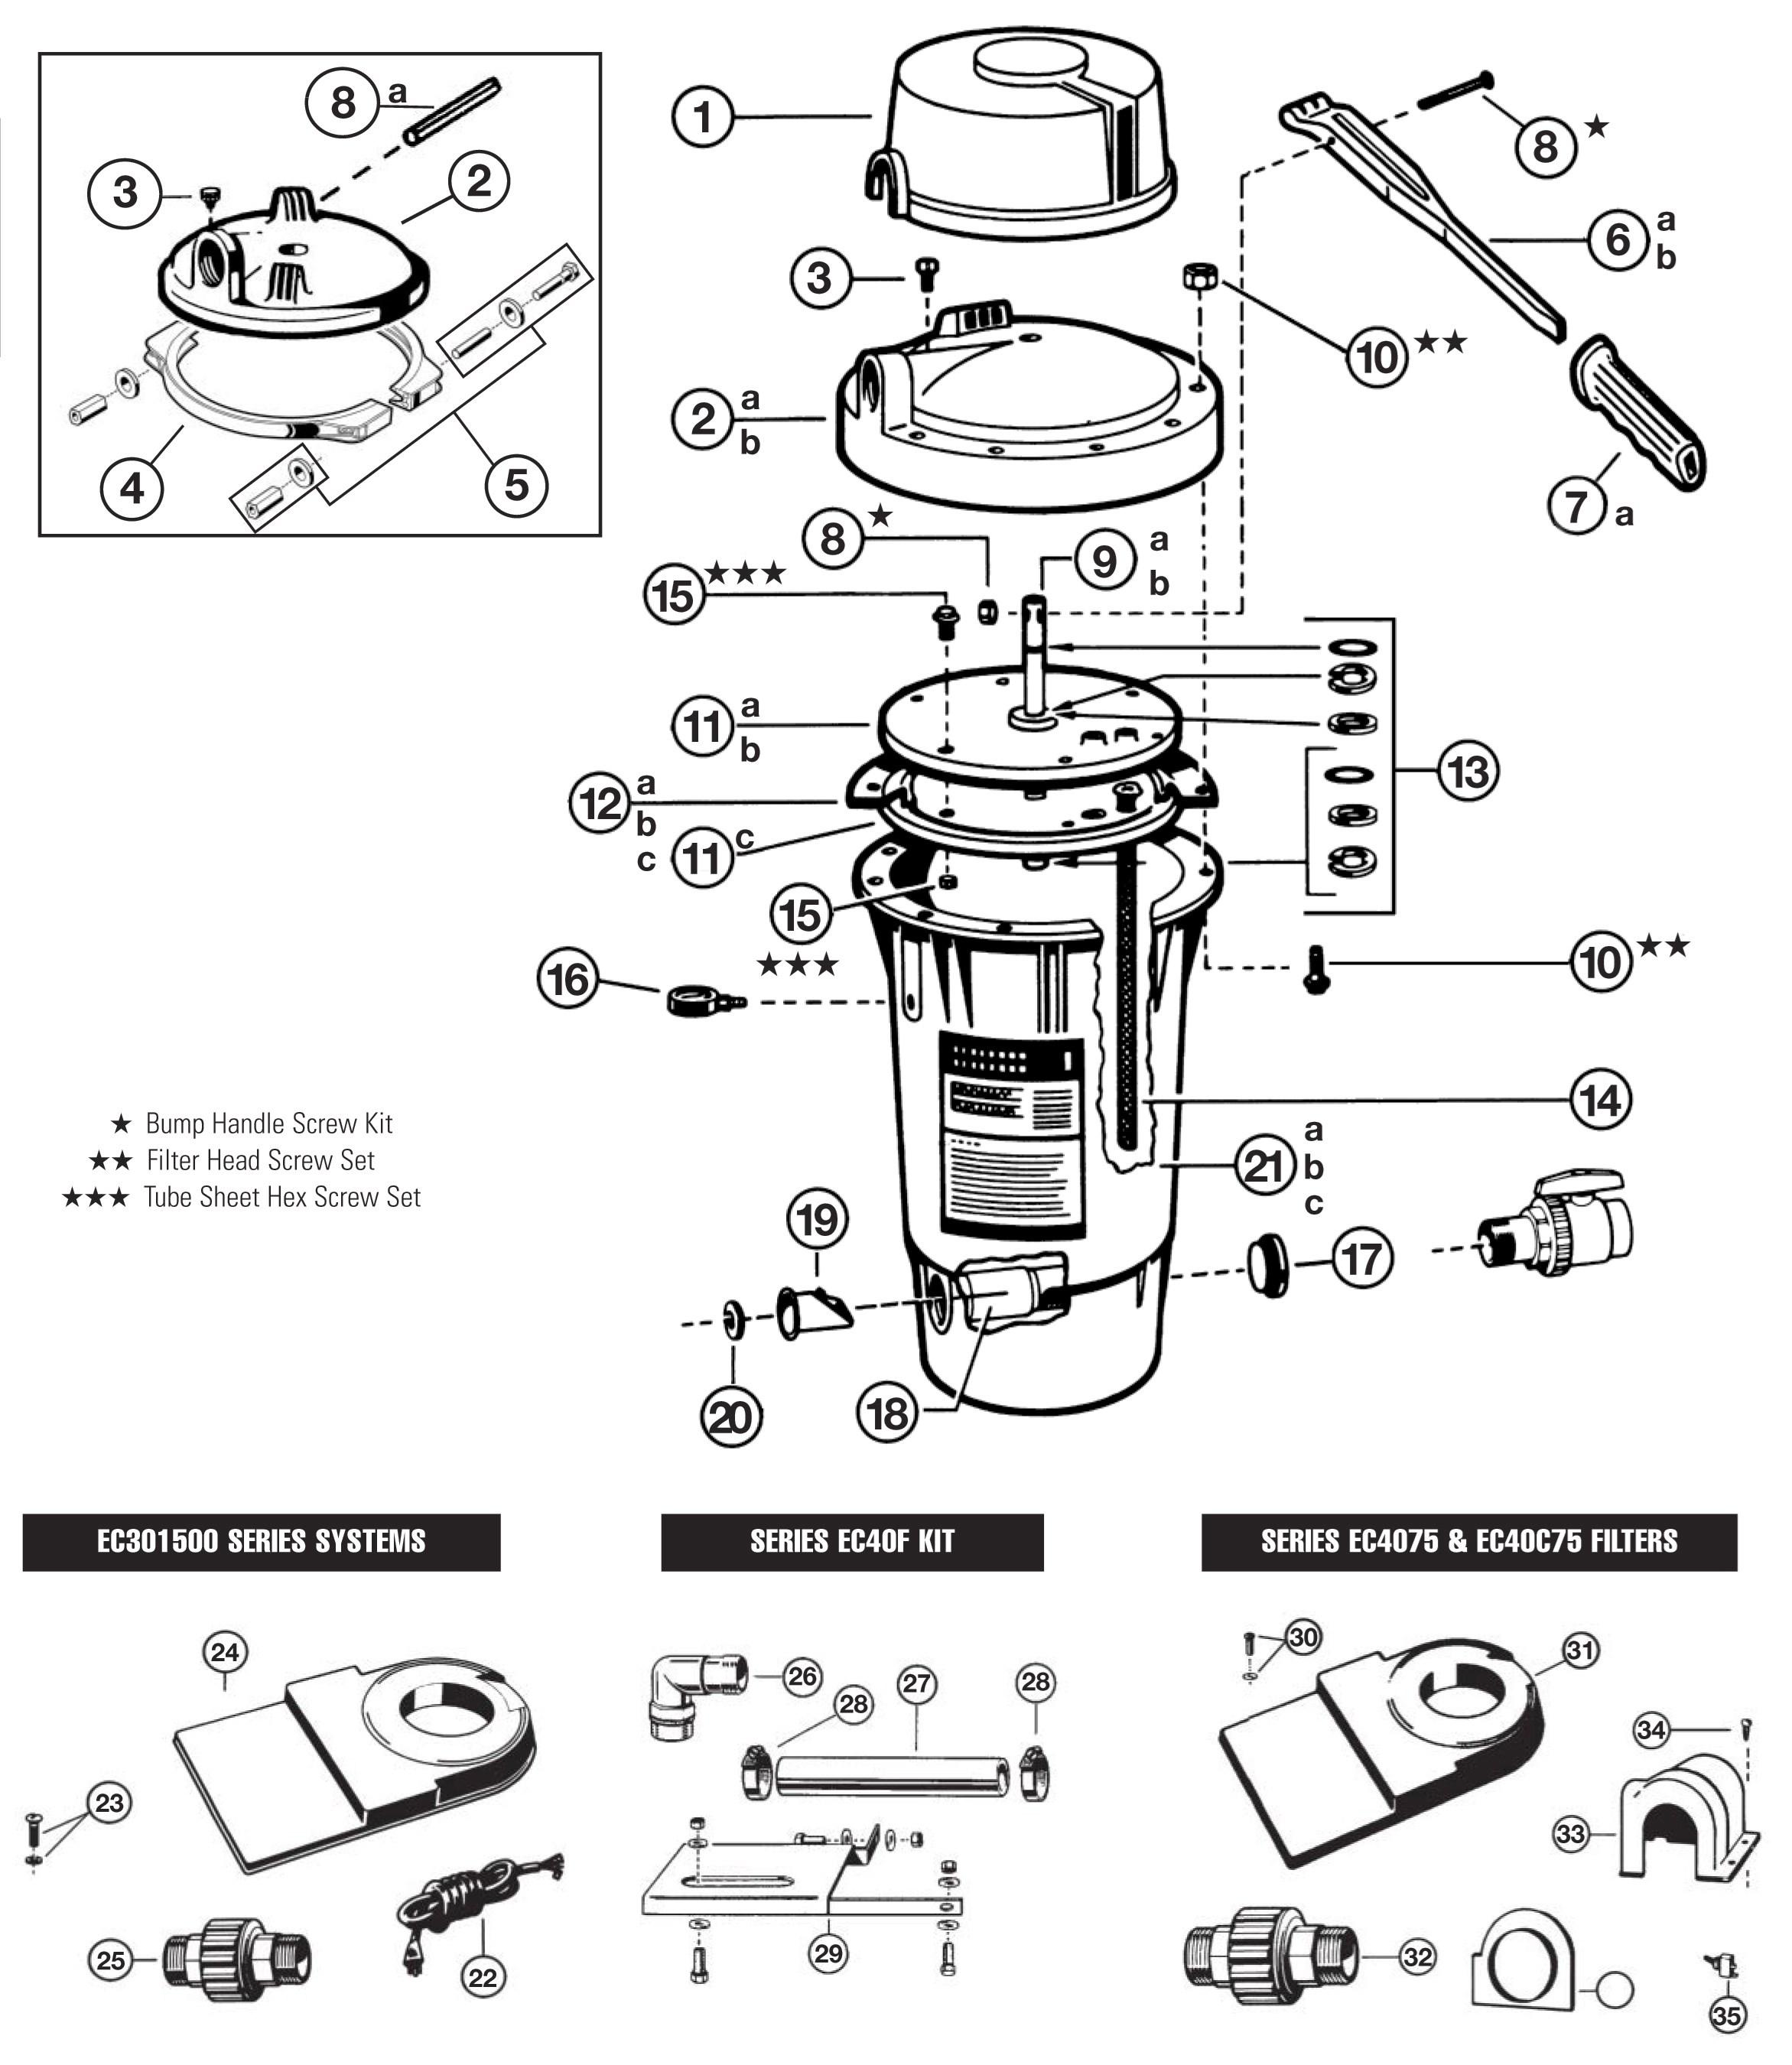 Hayward EC1161PAK Platform Base with Screws for Perflex DE Filter